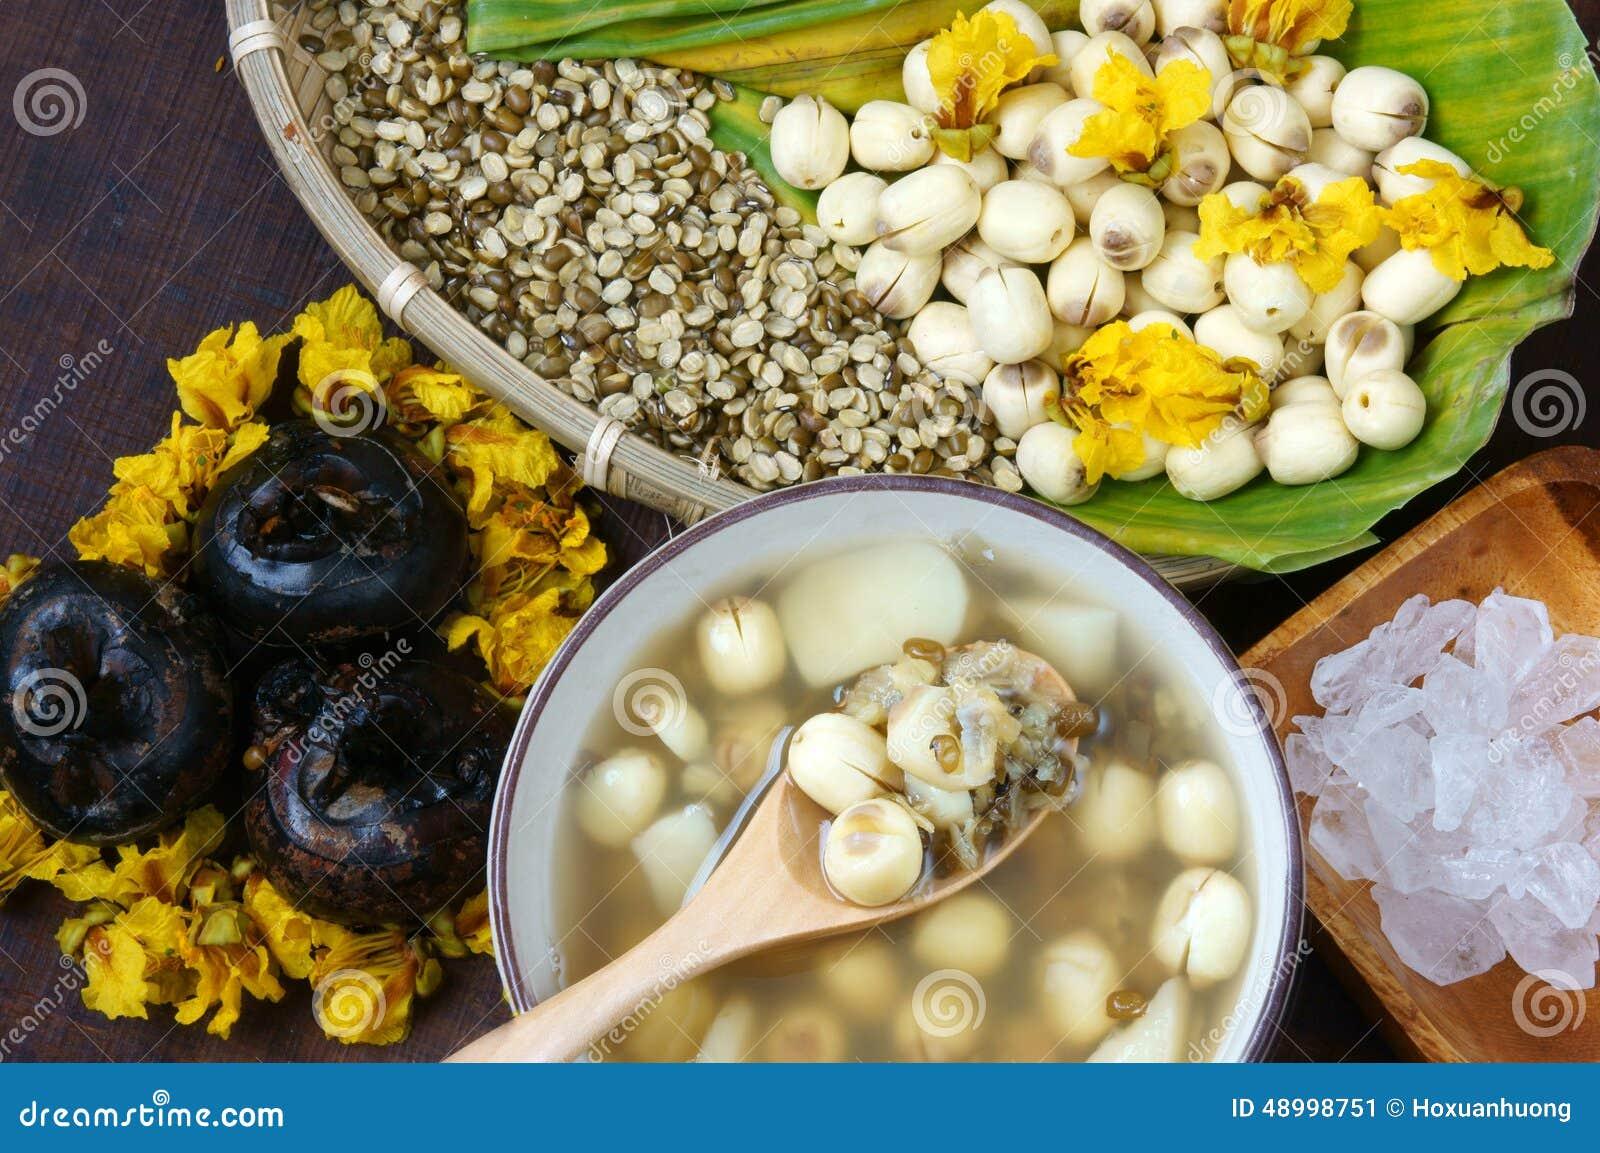 how to make vietnamese 3 color bean dessert